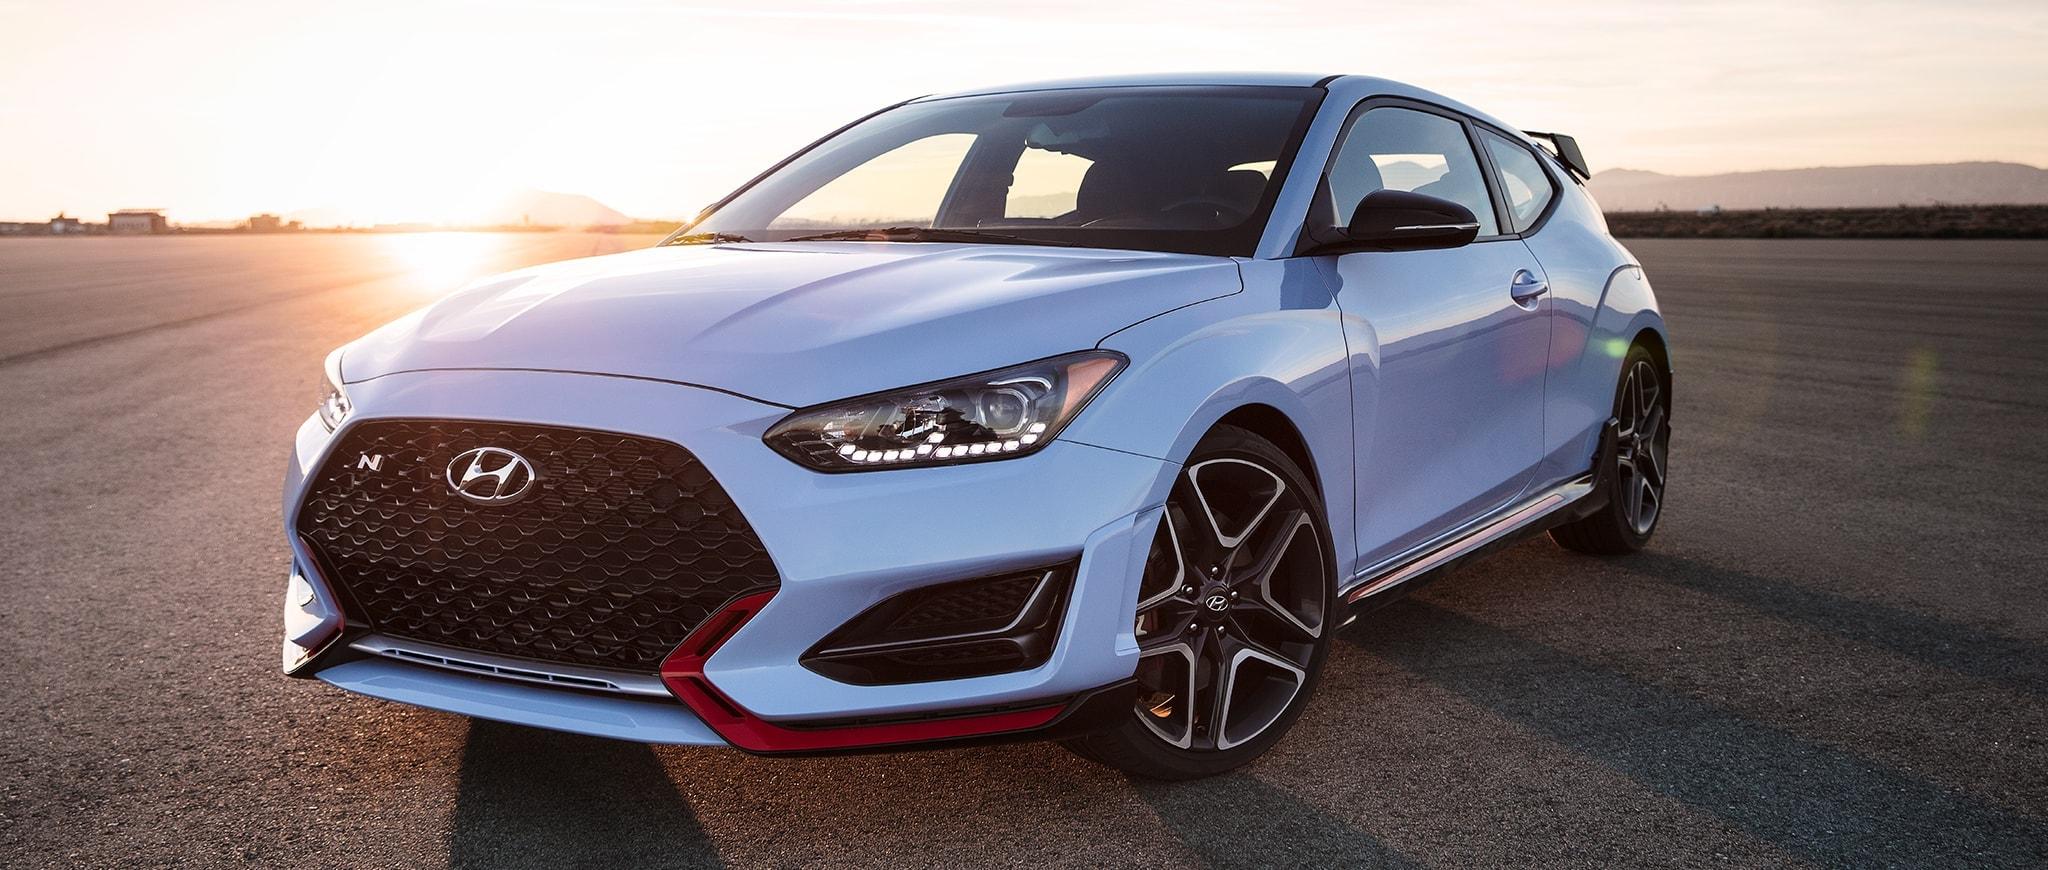 2020 Hyundai Veloster Review and Specs | Kearny Mesa ...